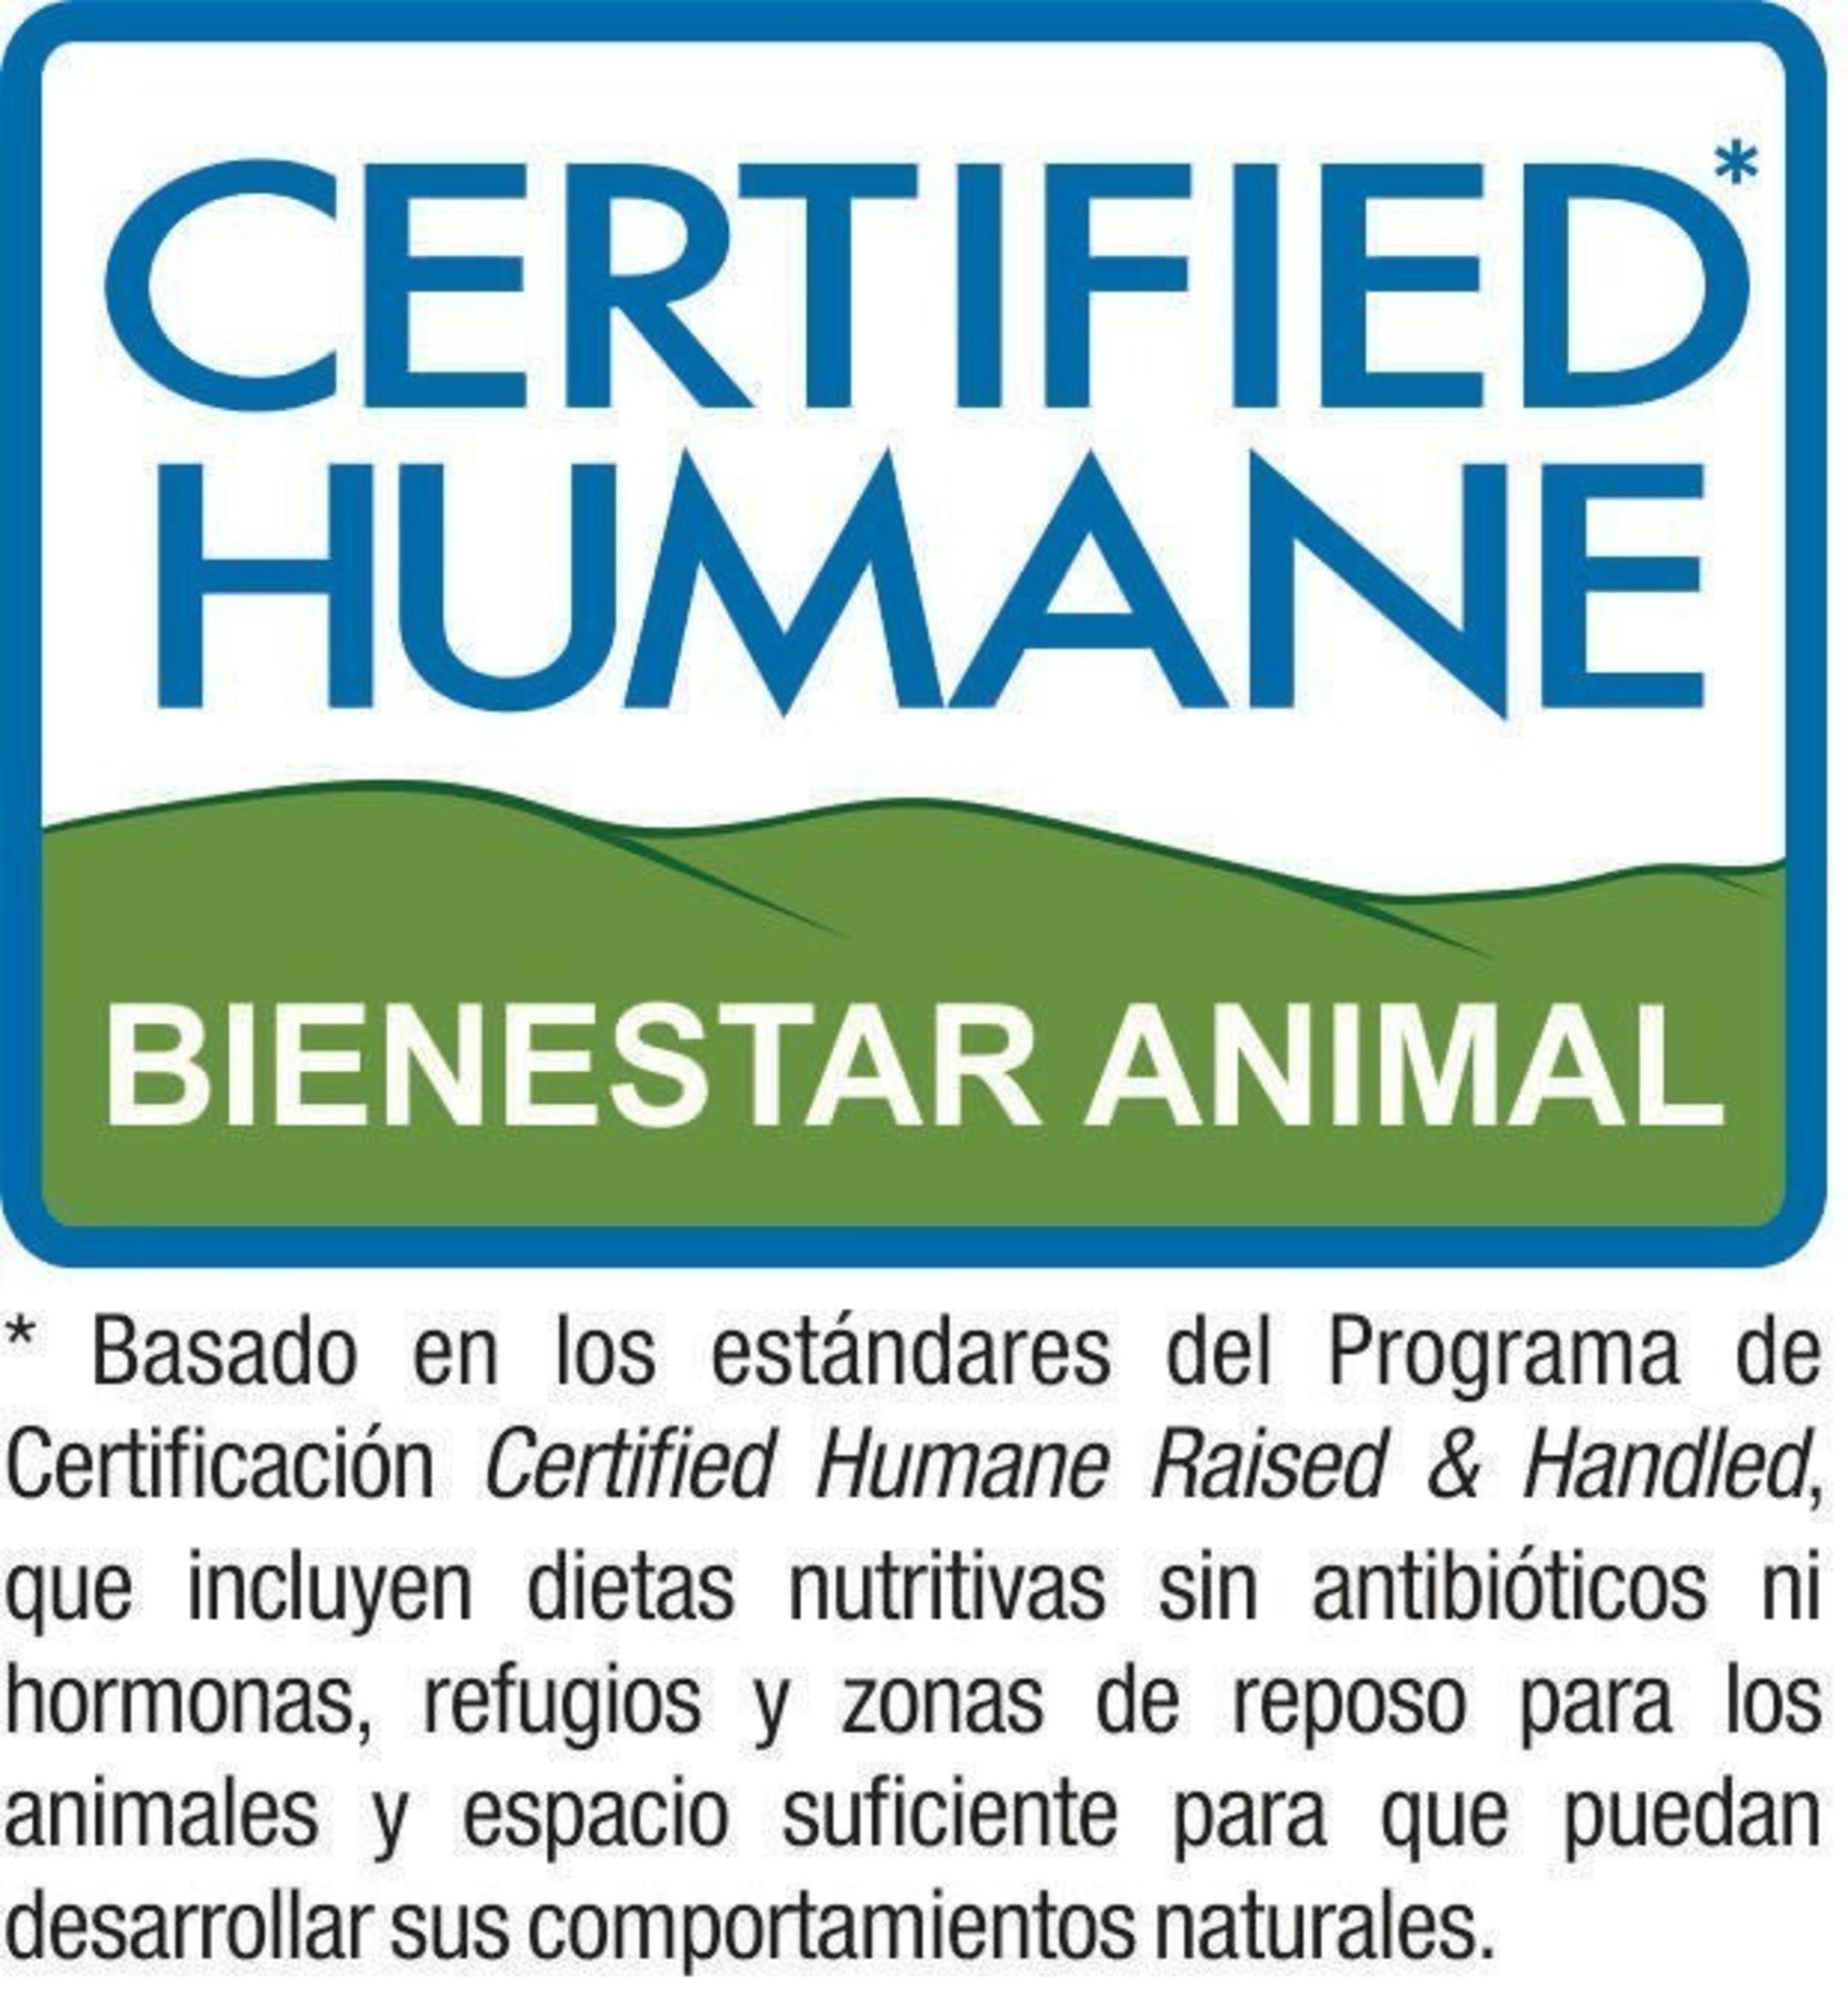 Certified Humane - Spanish